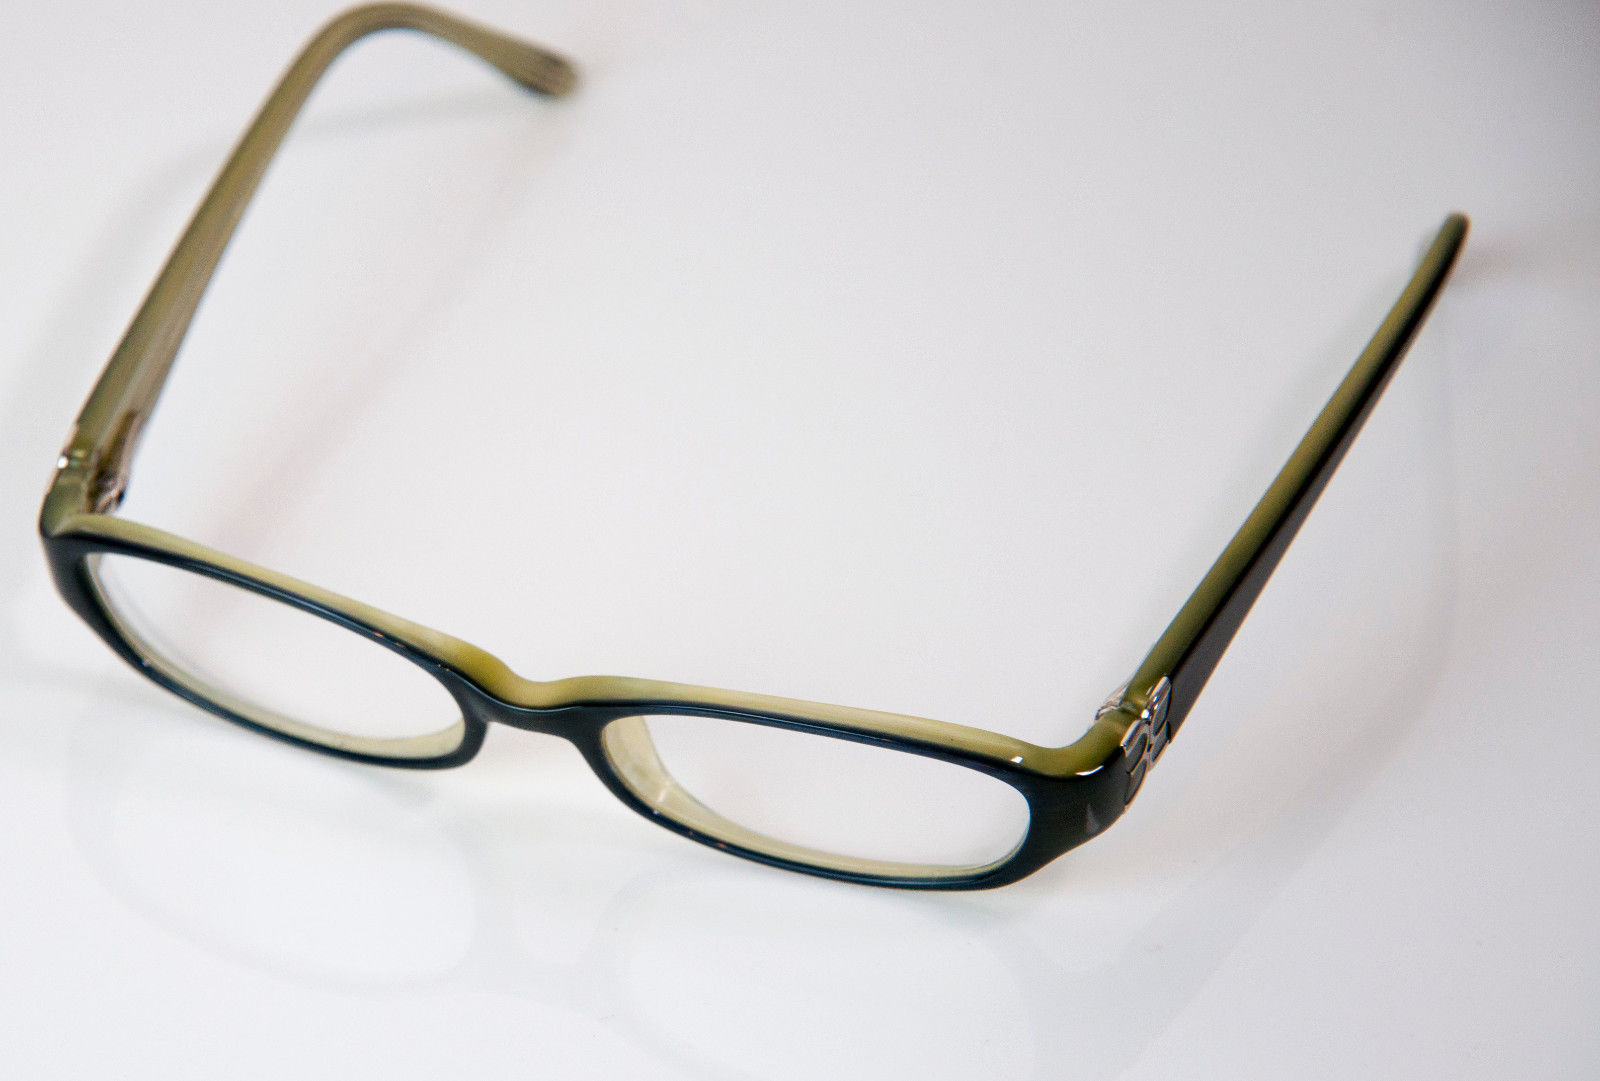 Eyeglass Frame By Size : Designer BCBG MAXAZRIA Eyeglass Frames Size L.125mm ...